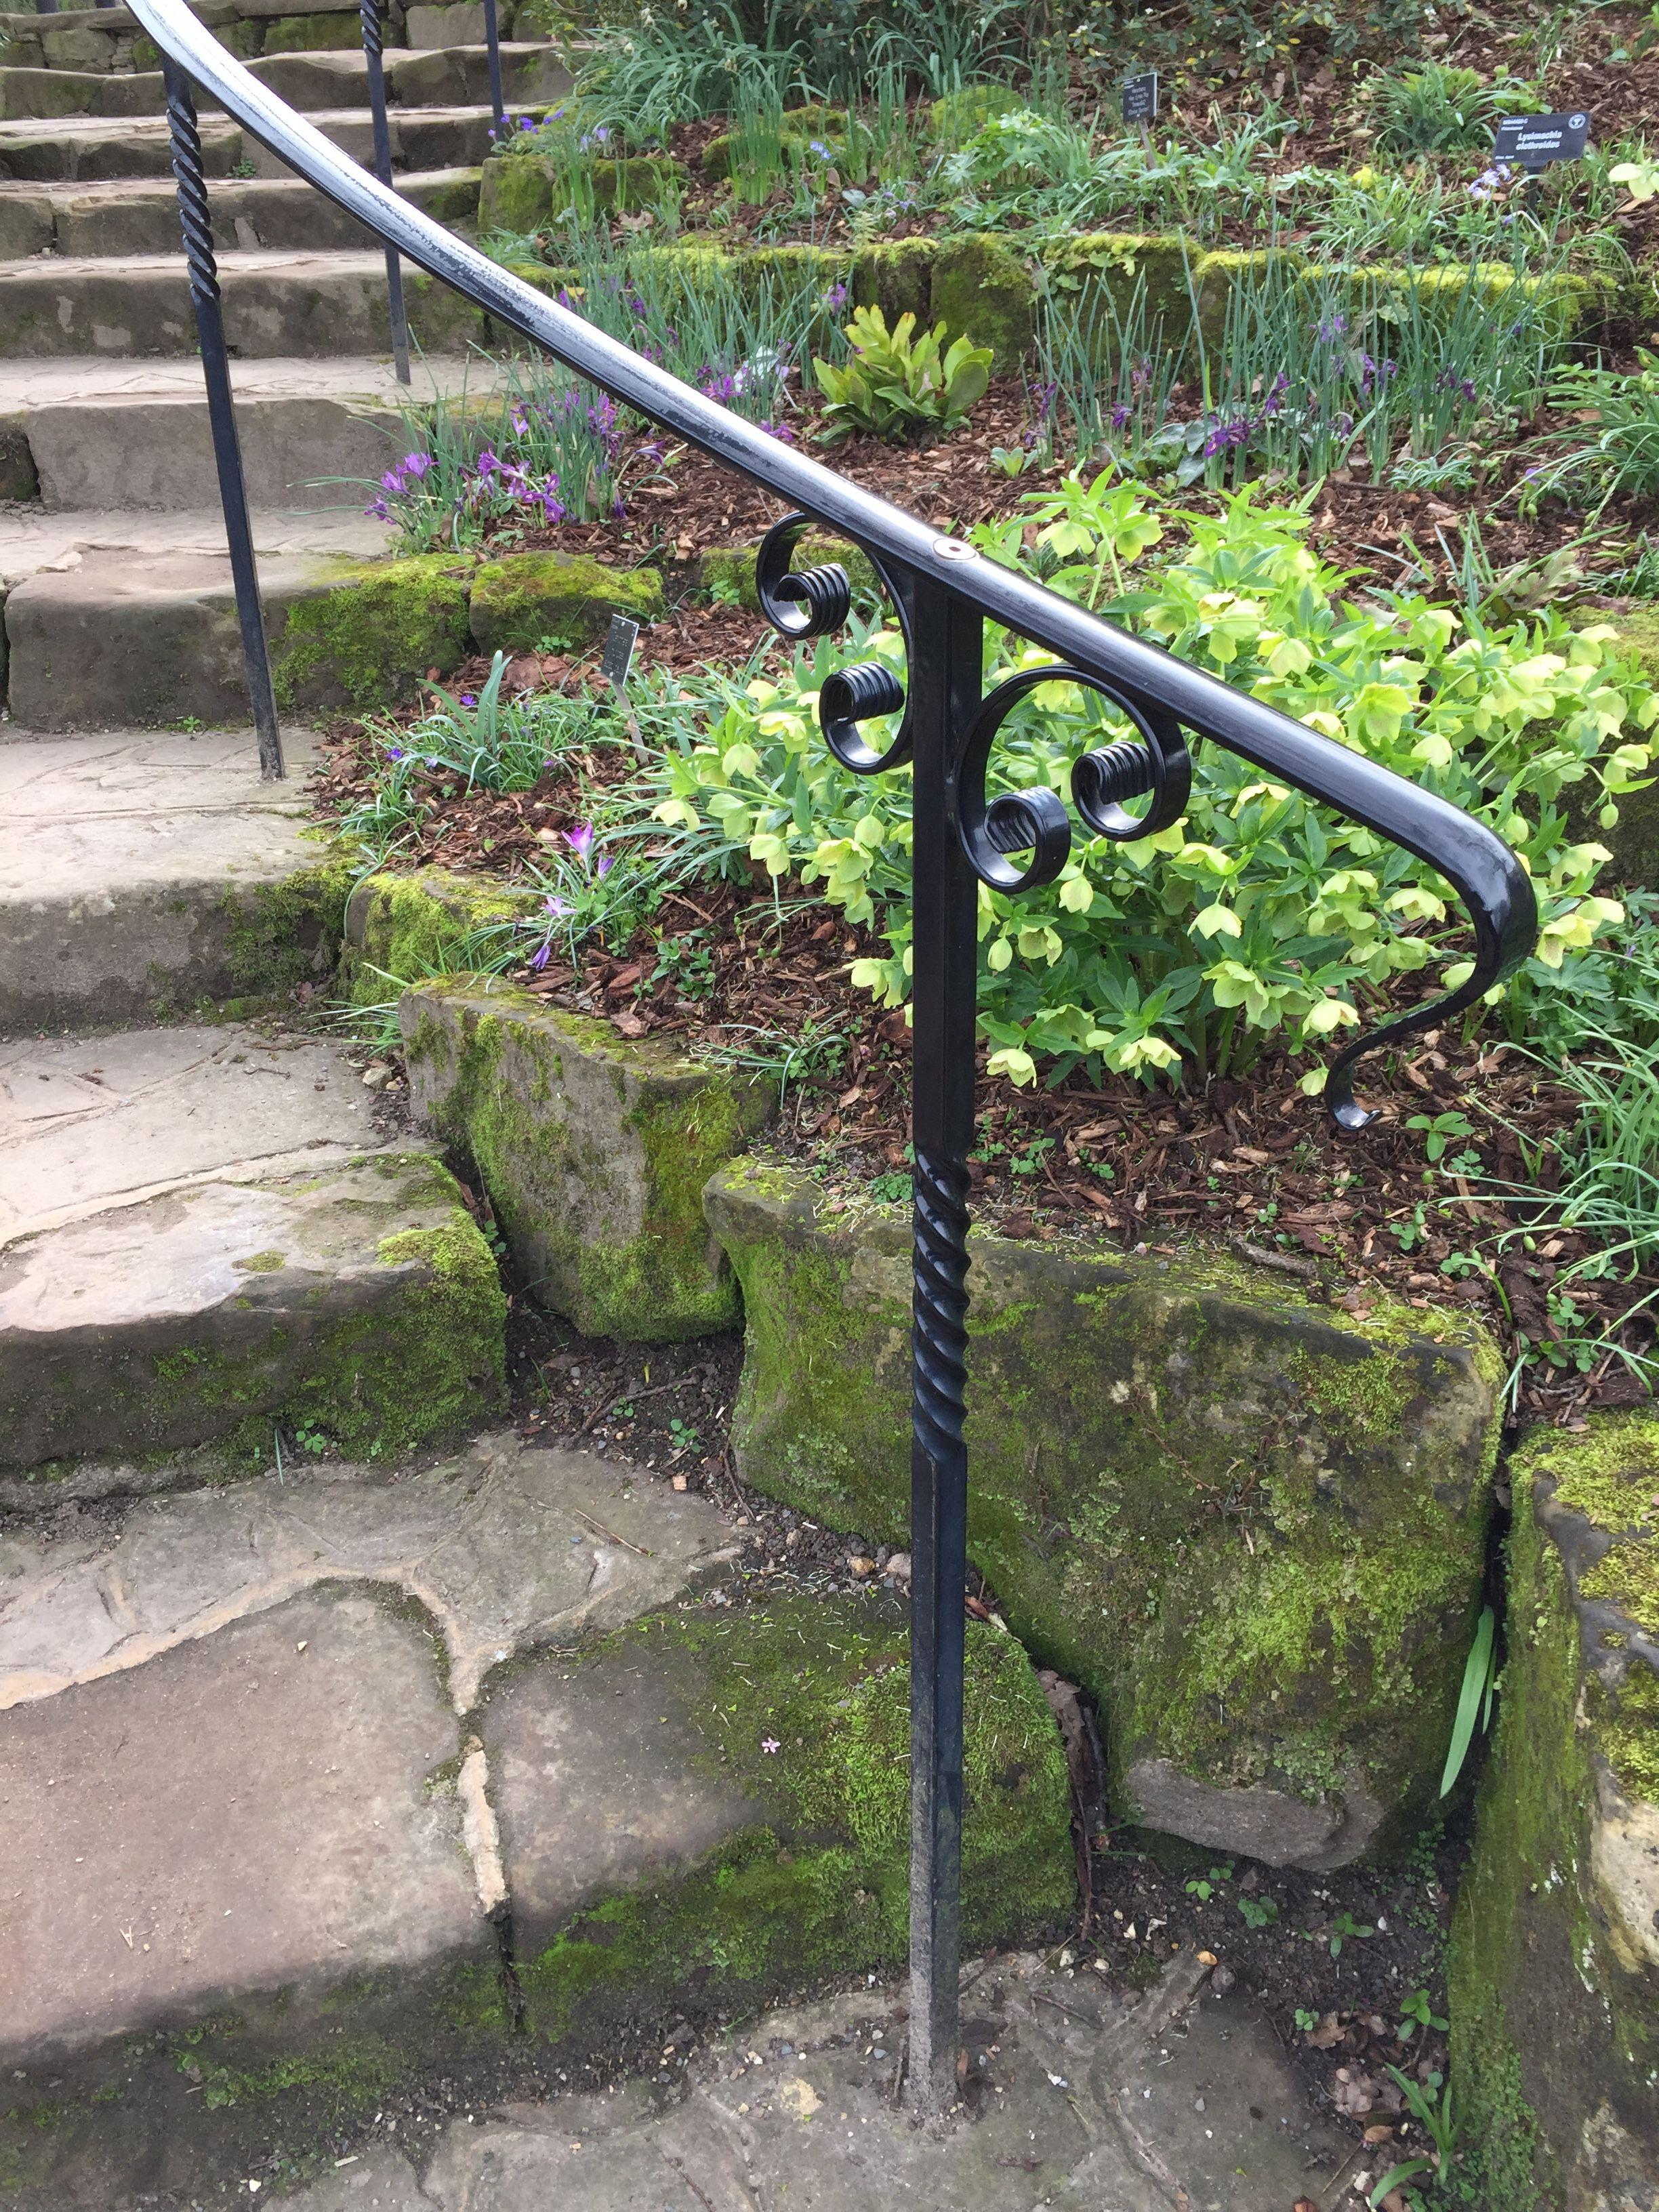 Beautiful Railings At Rhs Wisley Outdoor Stair Railing | Installing Railing On Stone Steps